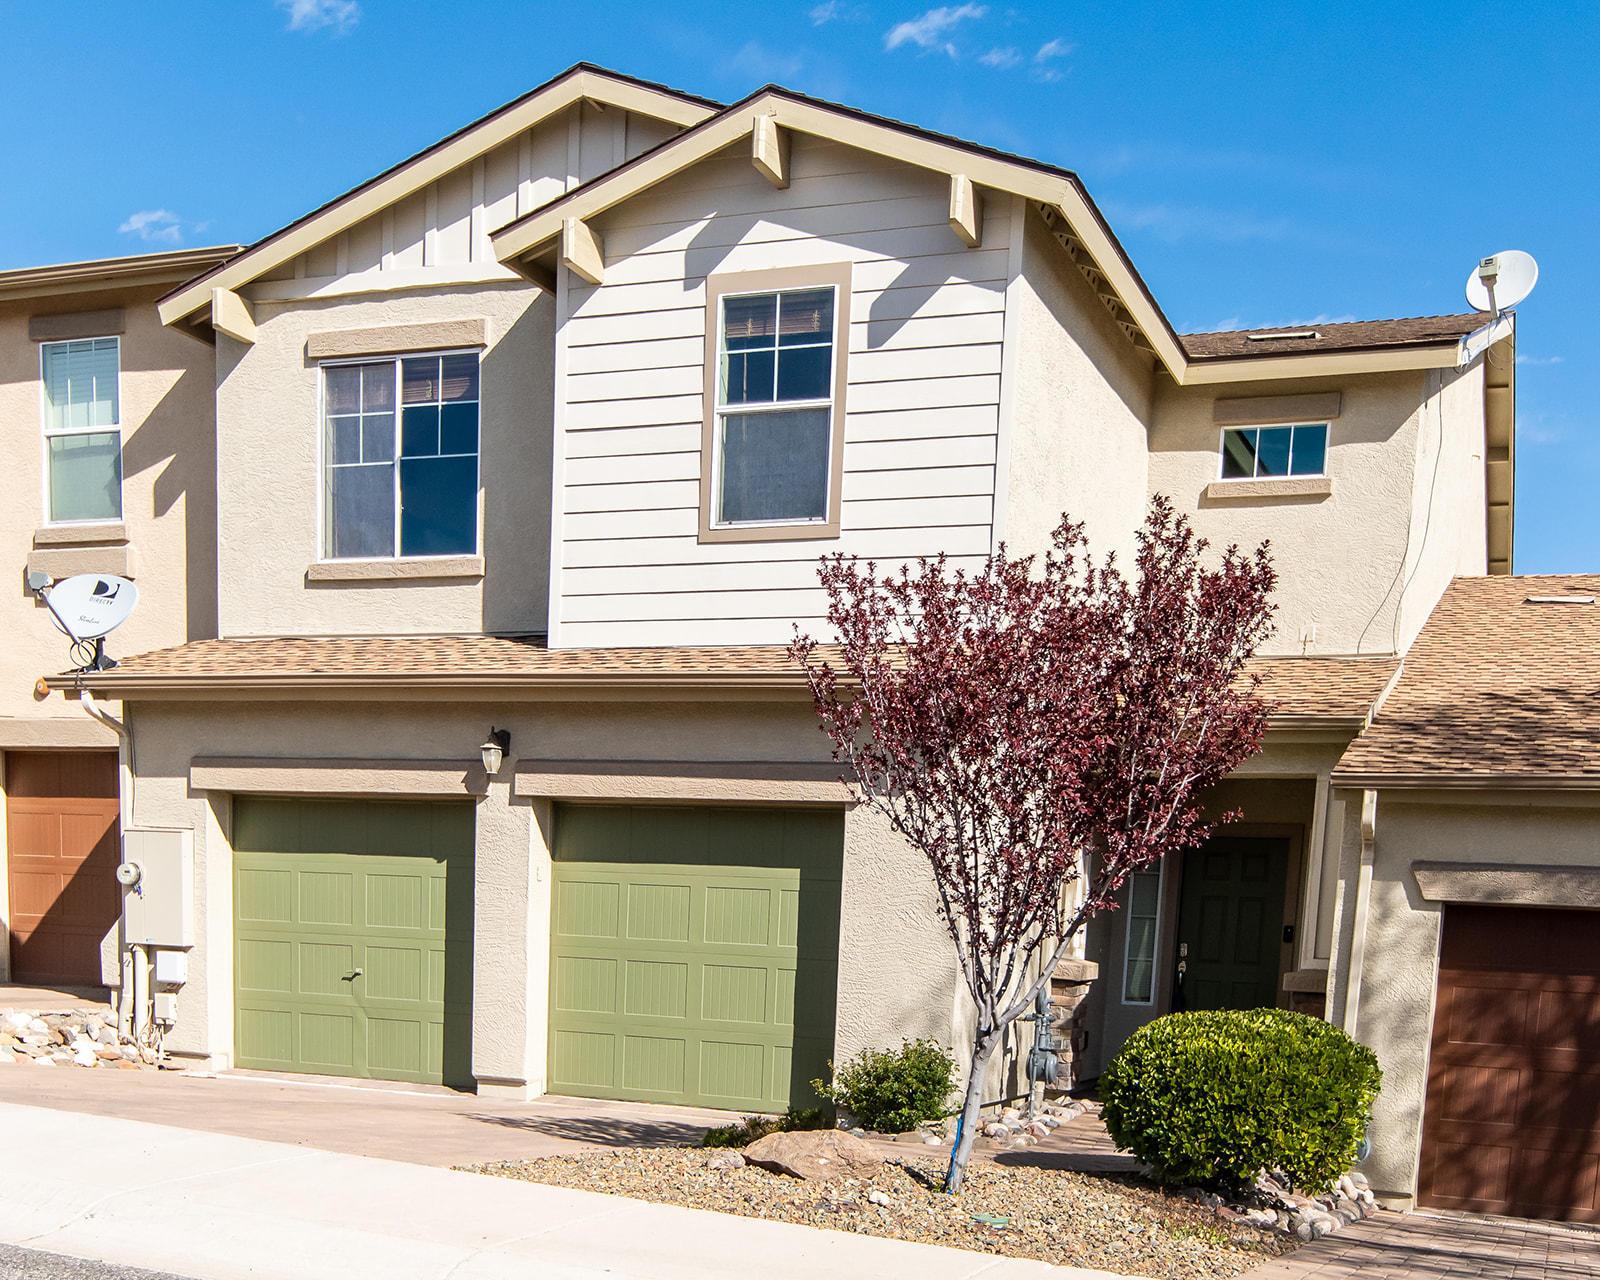 664 Brindle Drive Clarkdale, AZ 86324